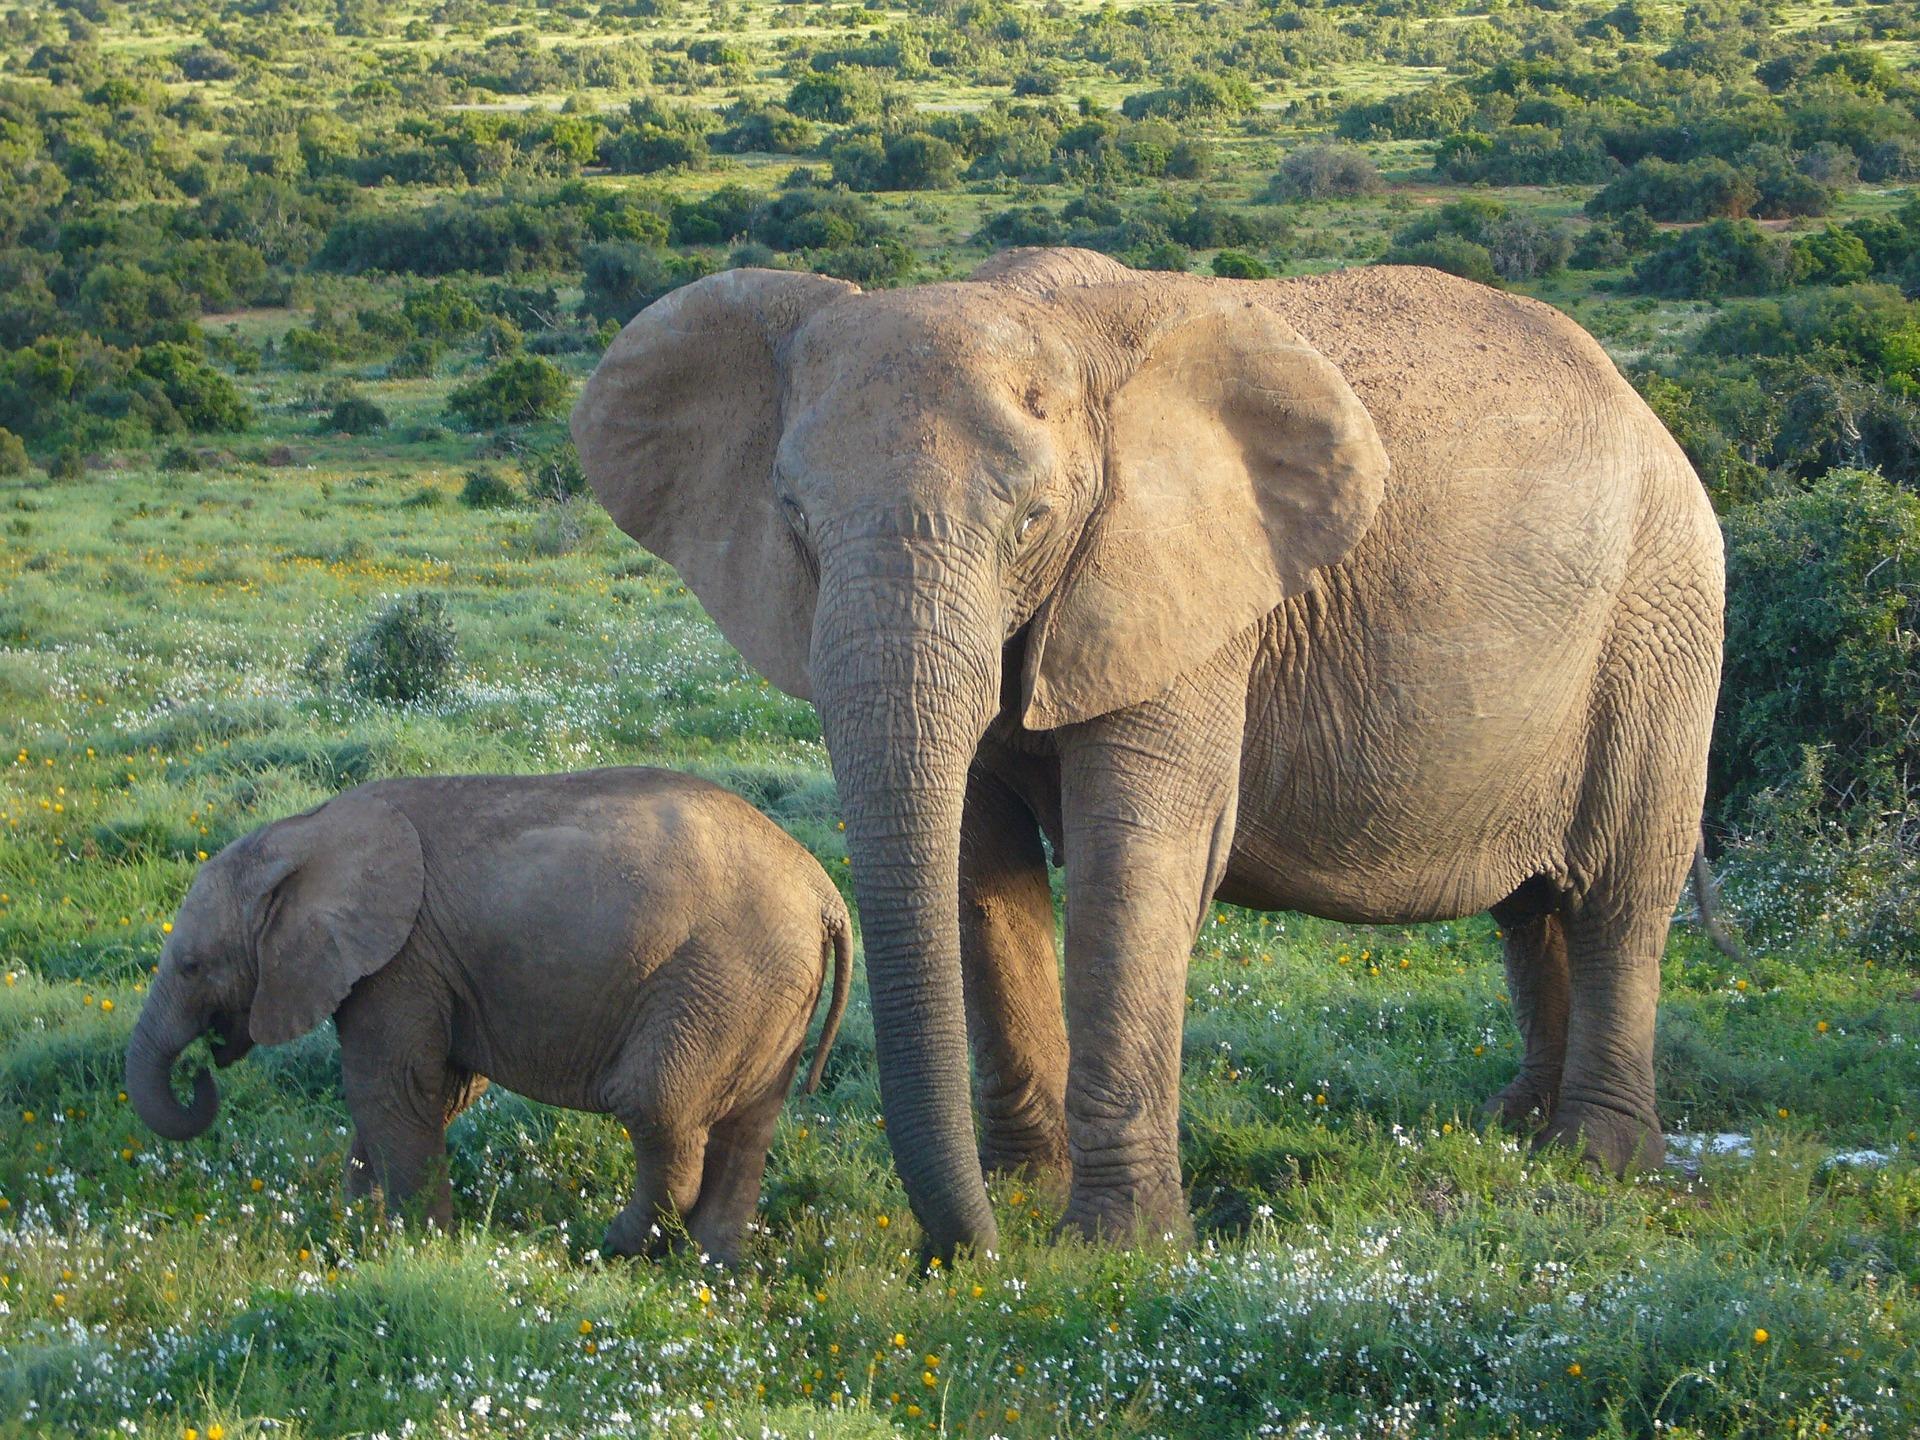 African Elephants, Nature, Wild, Giant, Elephant, HQ Photo